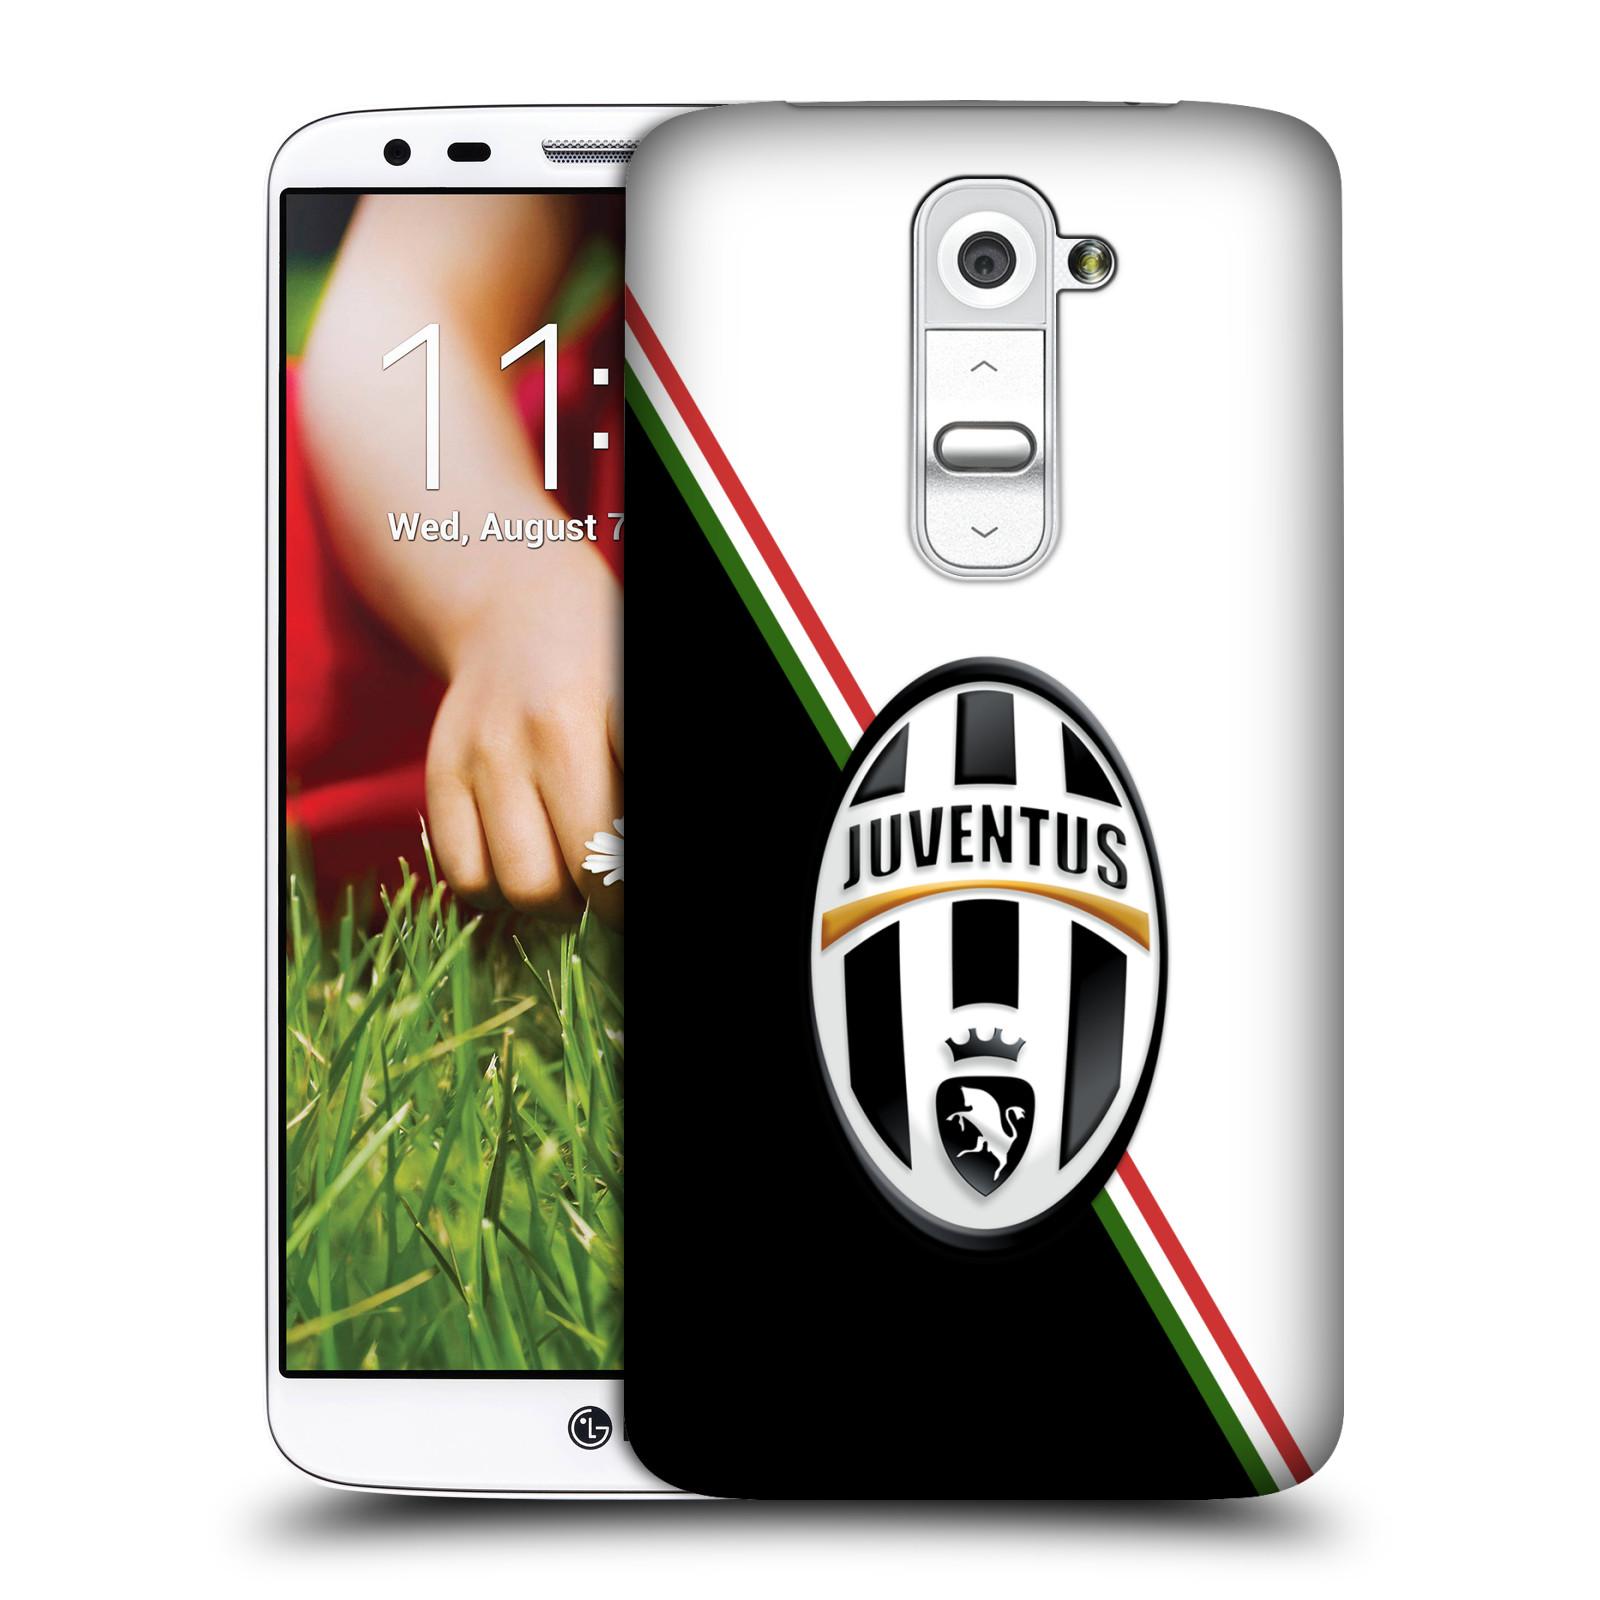 Lg G2 White 16gb D802 Plastov Pouzdro Na Mobil Head Case Juventus Fc Black And